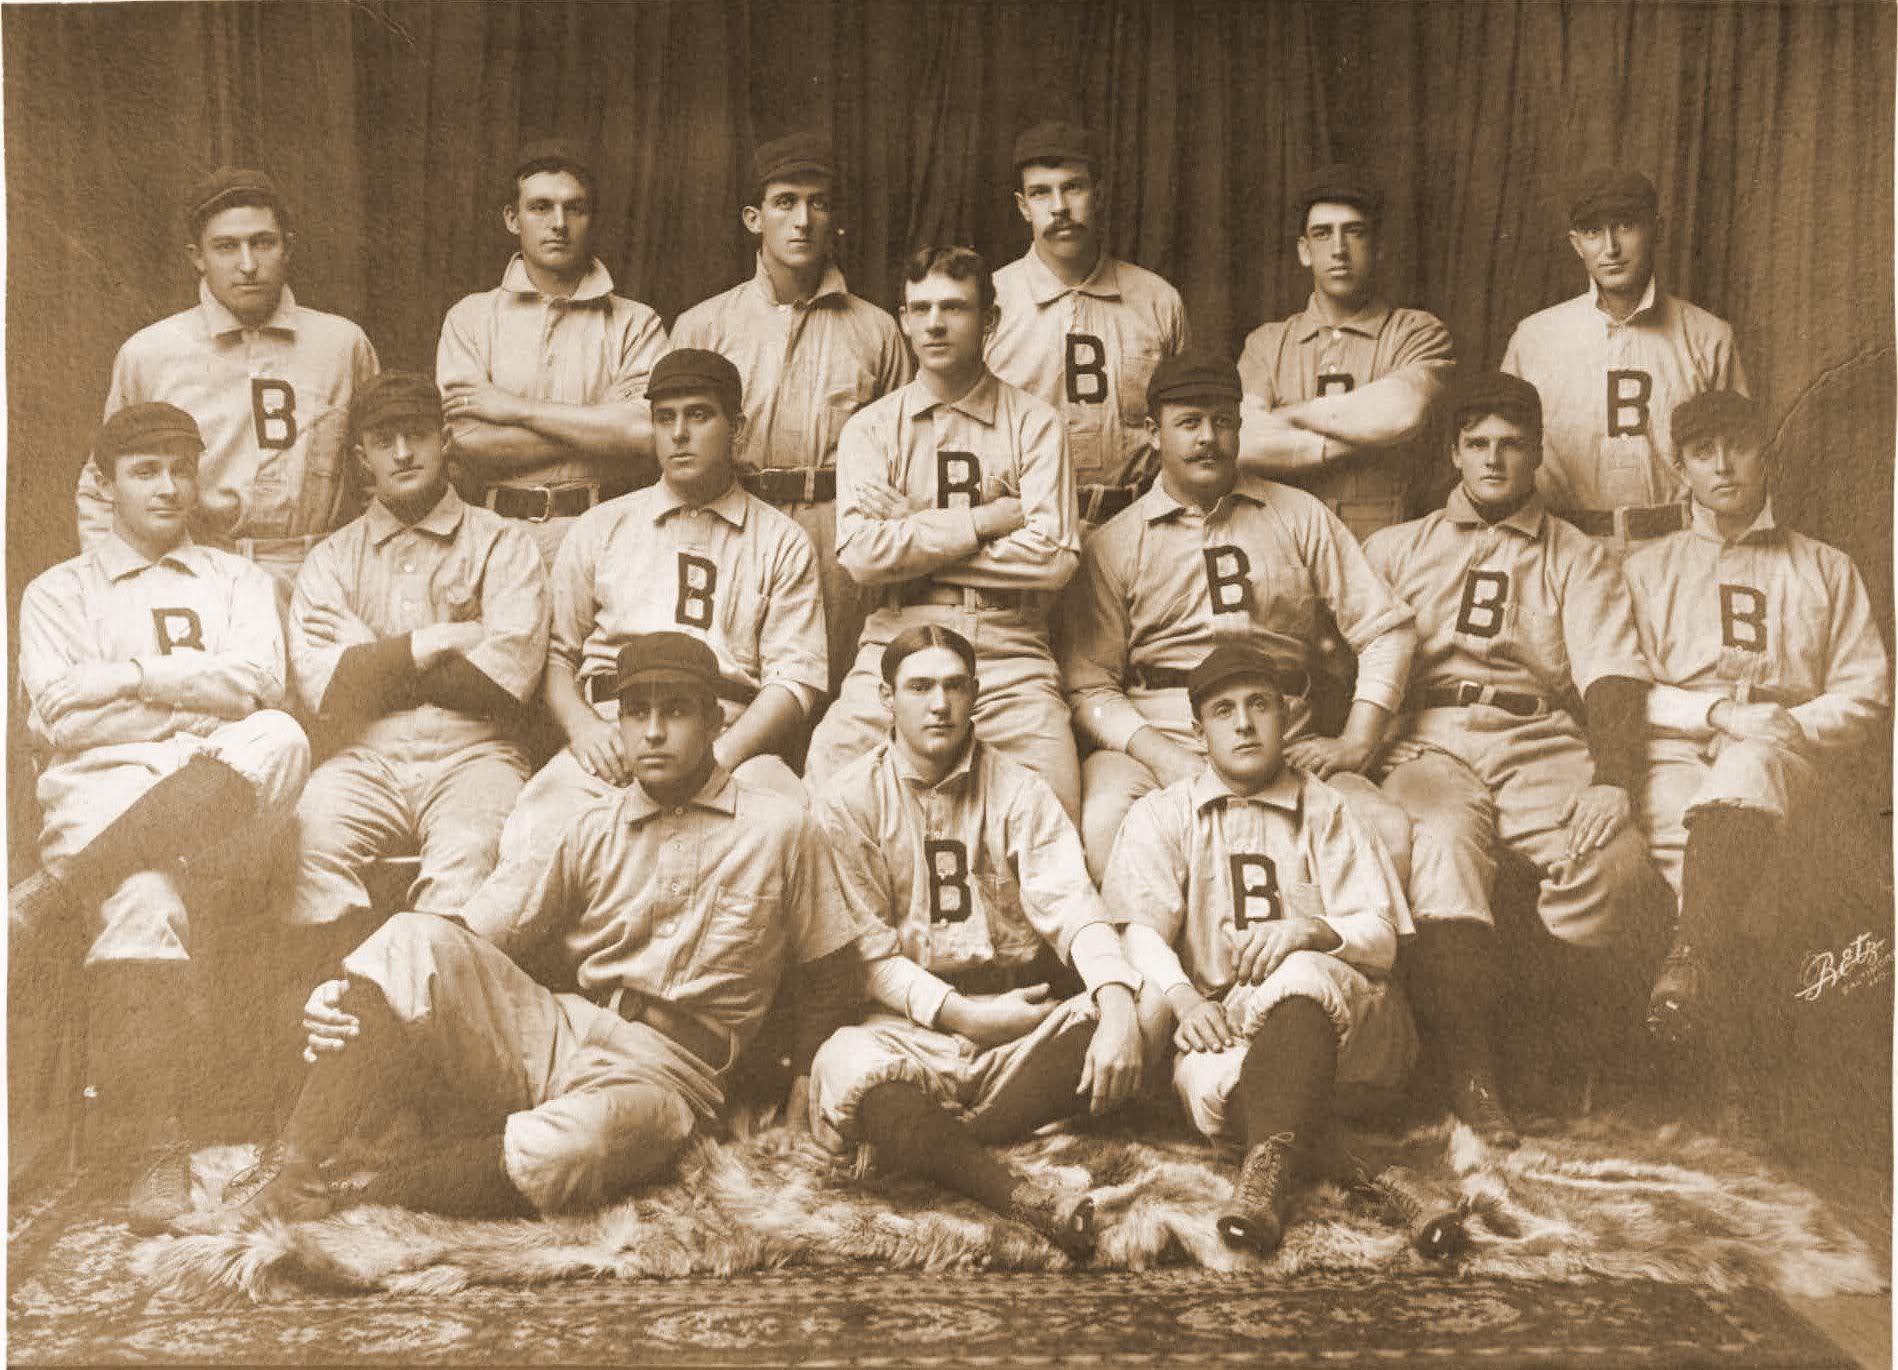 1899 Baltimore Orioles season - Wikipedia